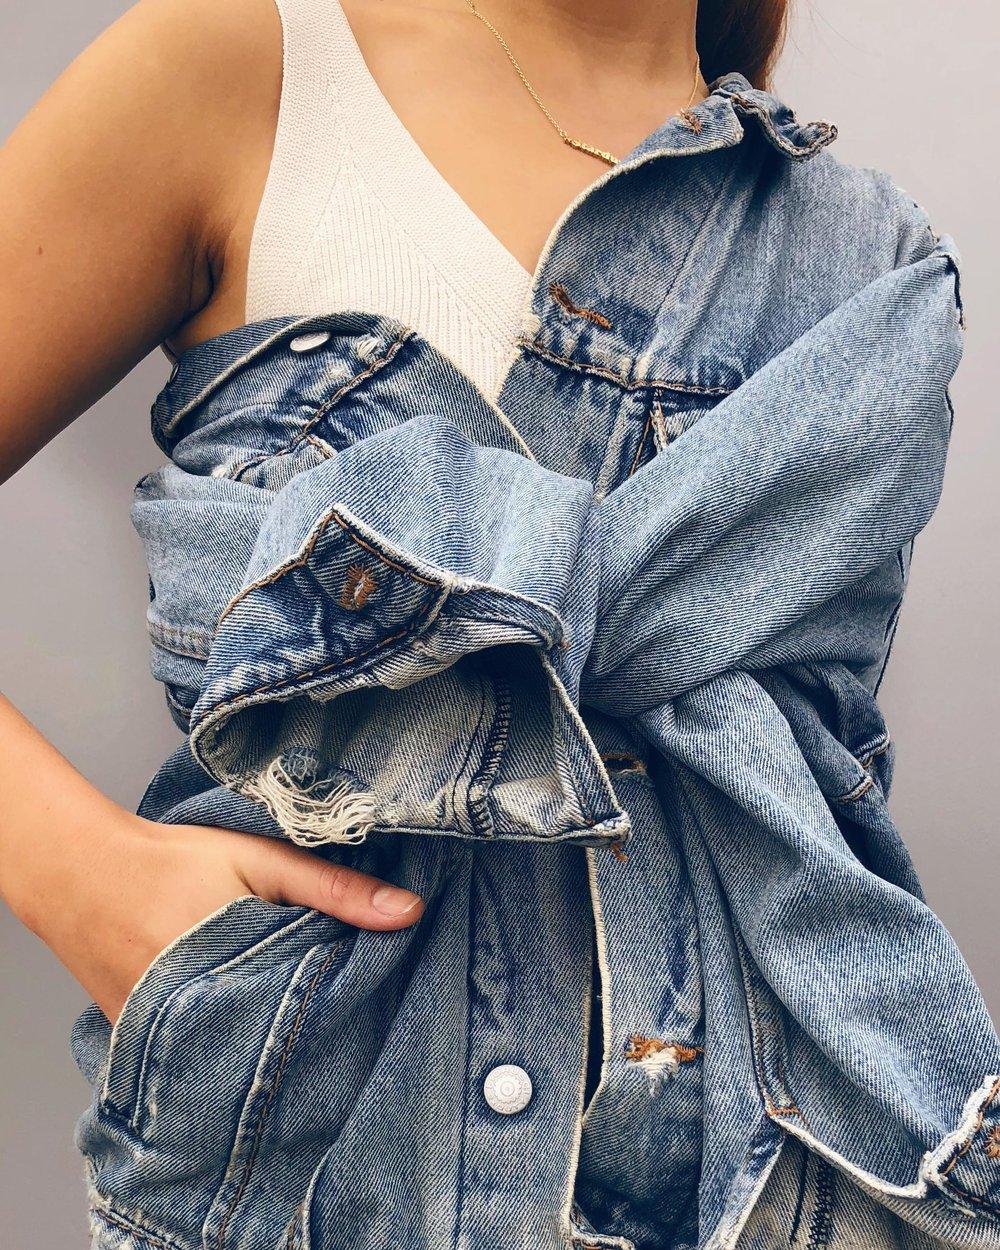 jeanssecondhand.jpg